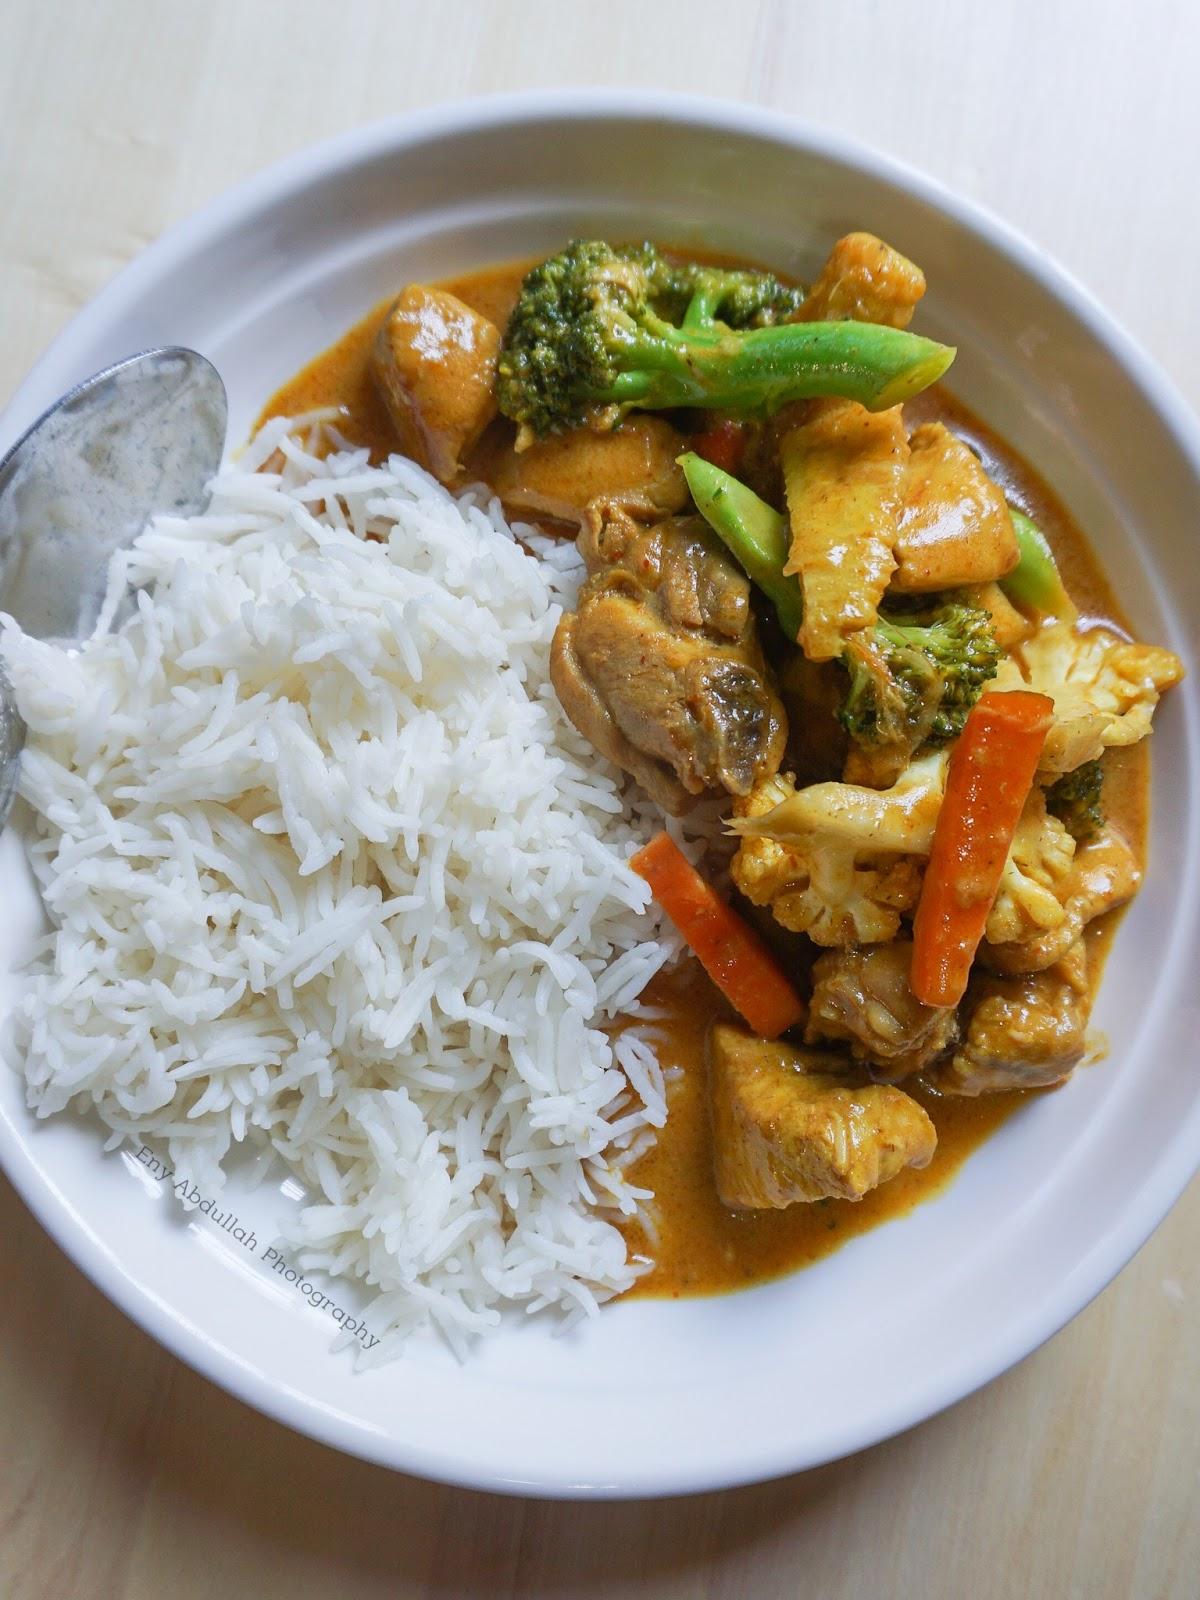 Resepi Phad phed, resepi paprik, phadphet, chicken phadphet, phadprik, thai curry, lauk thai